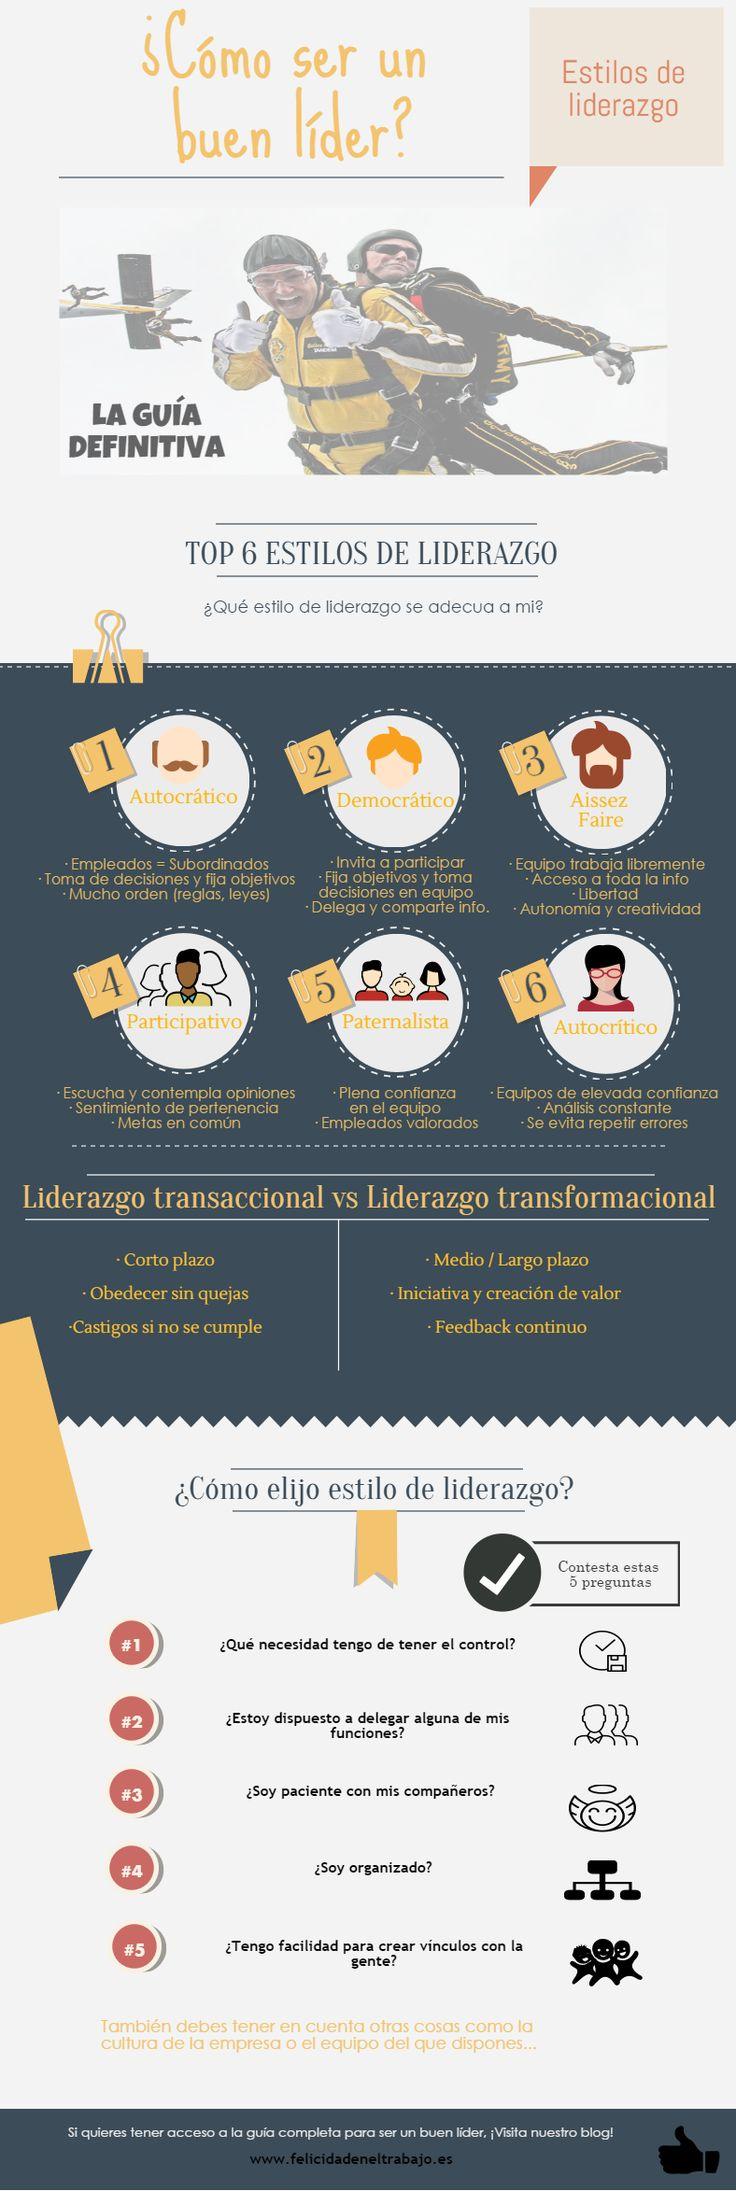 Estilos de Liderazgo: la guía definitiva #infografia #infographic #leadership